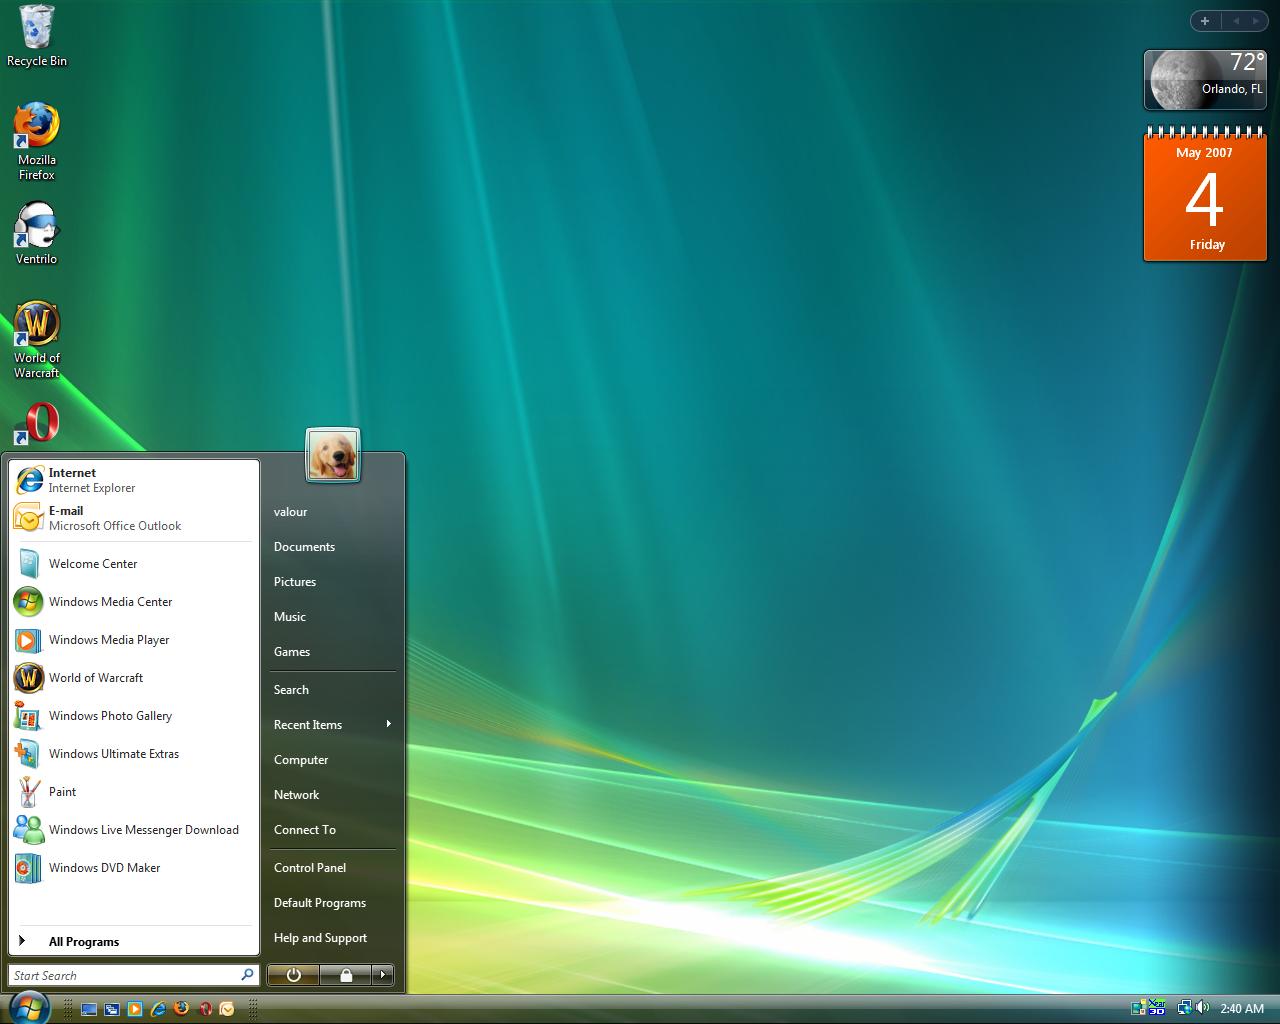 Windows Vista Desktop photos, Picture collage maker